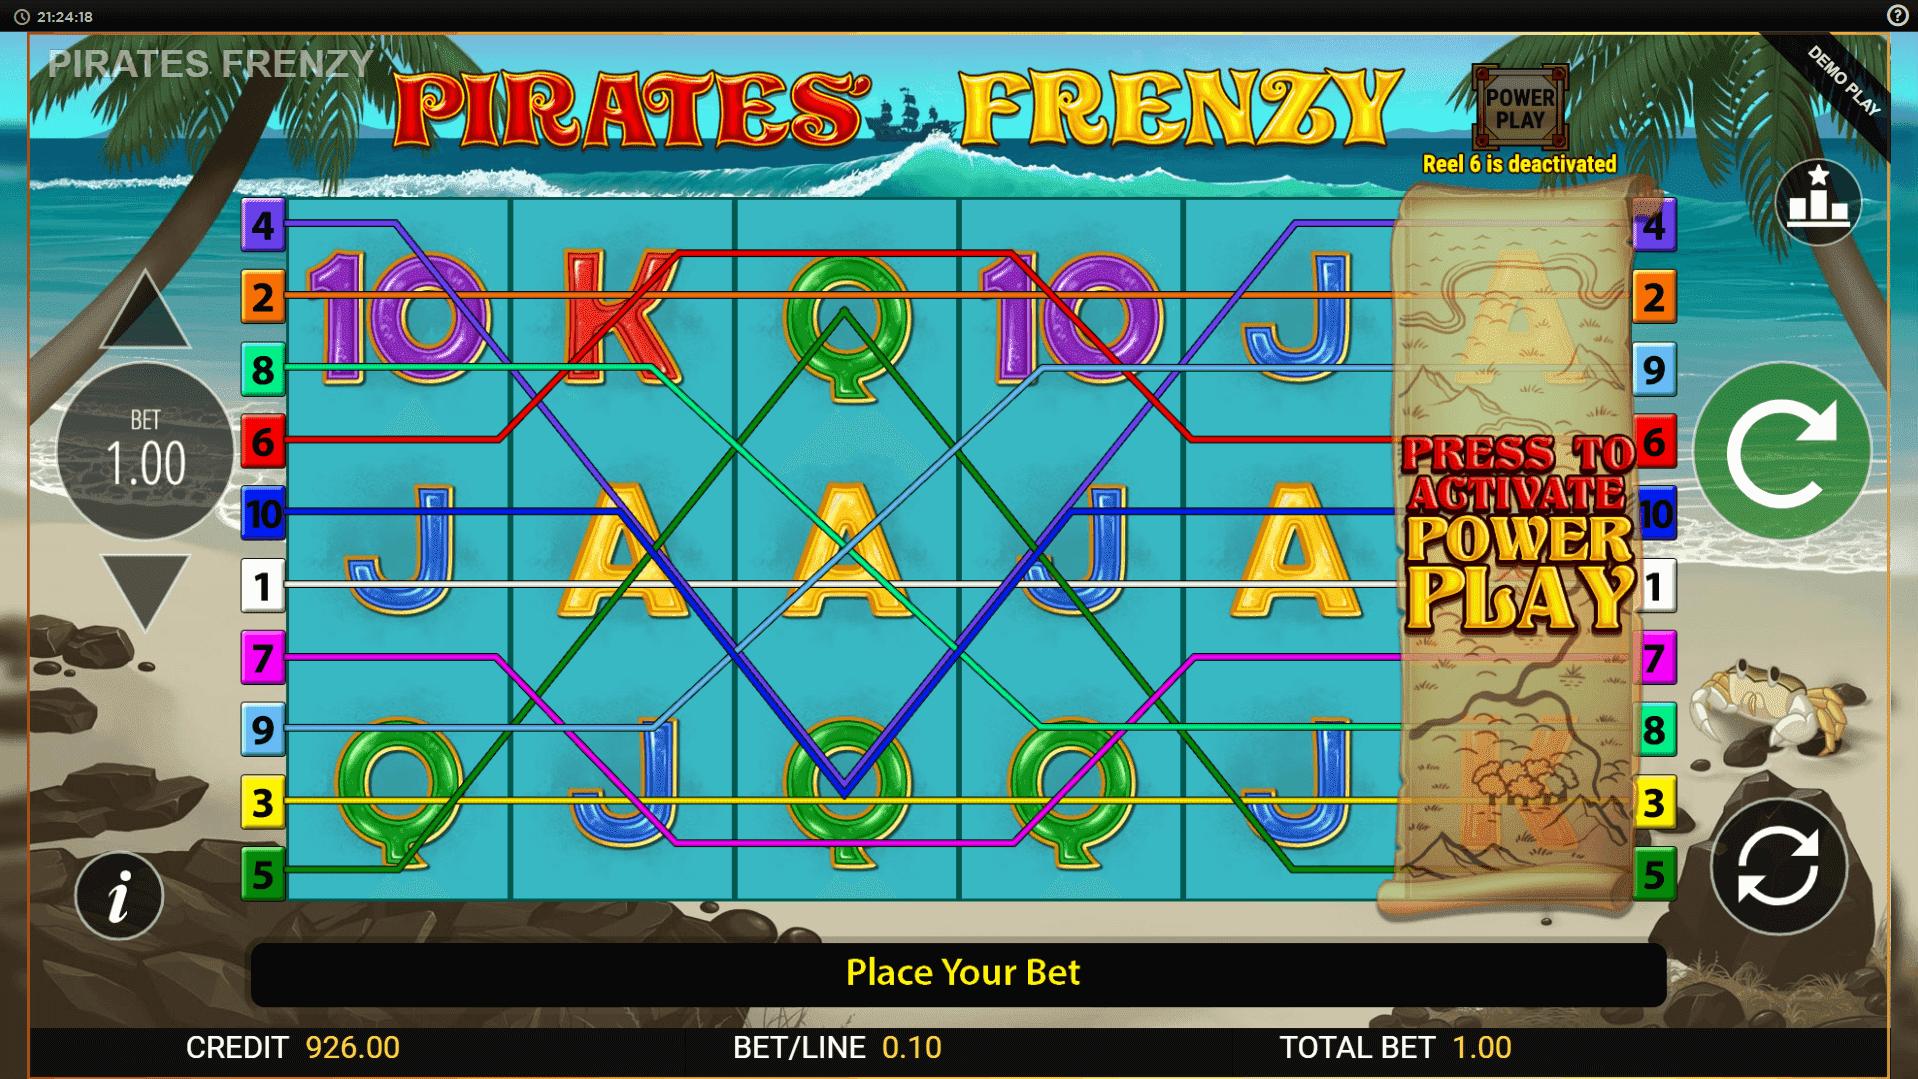 Pirates Frenzy slot machine screenshot